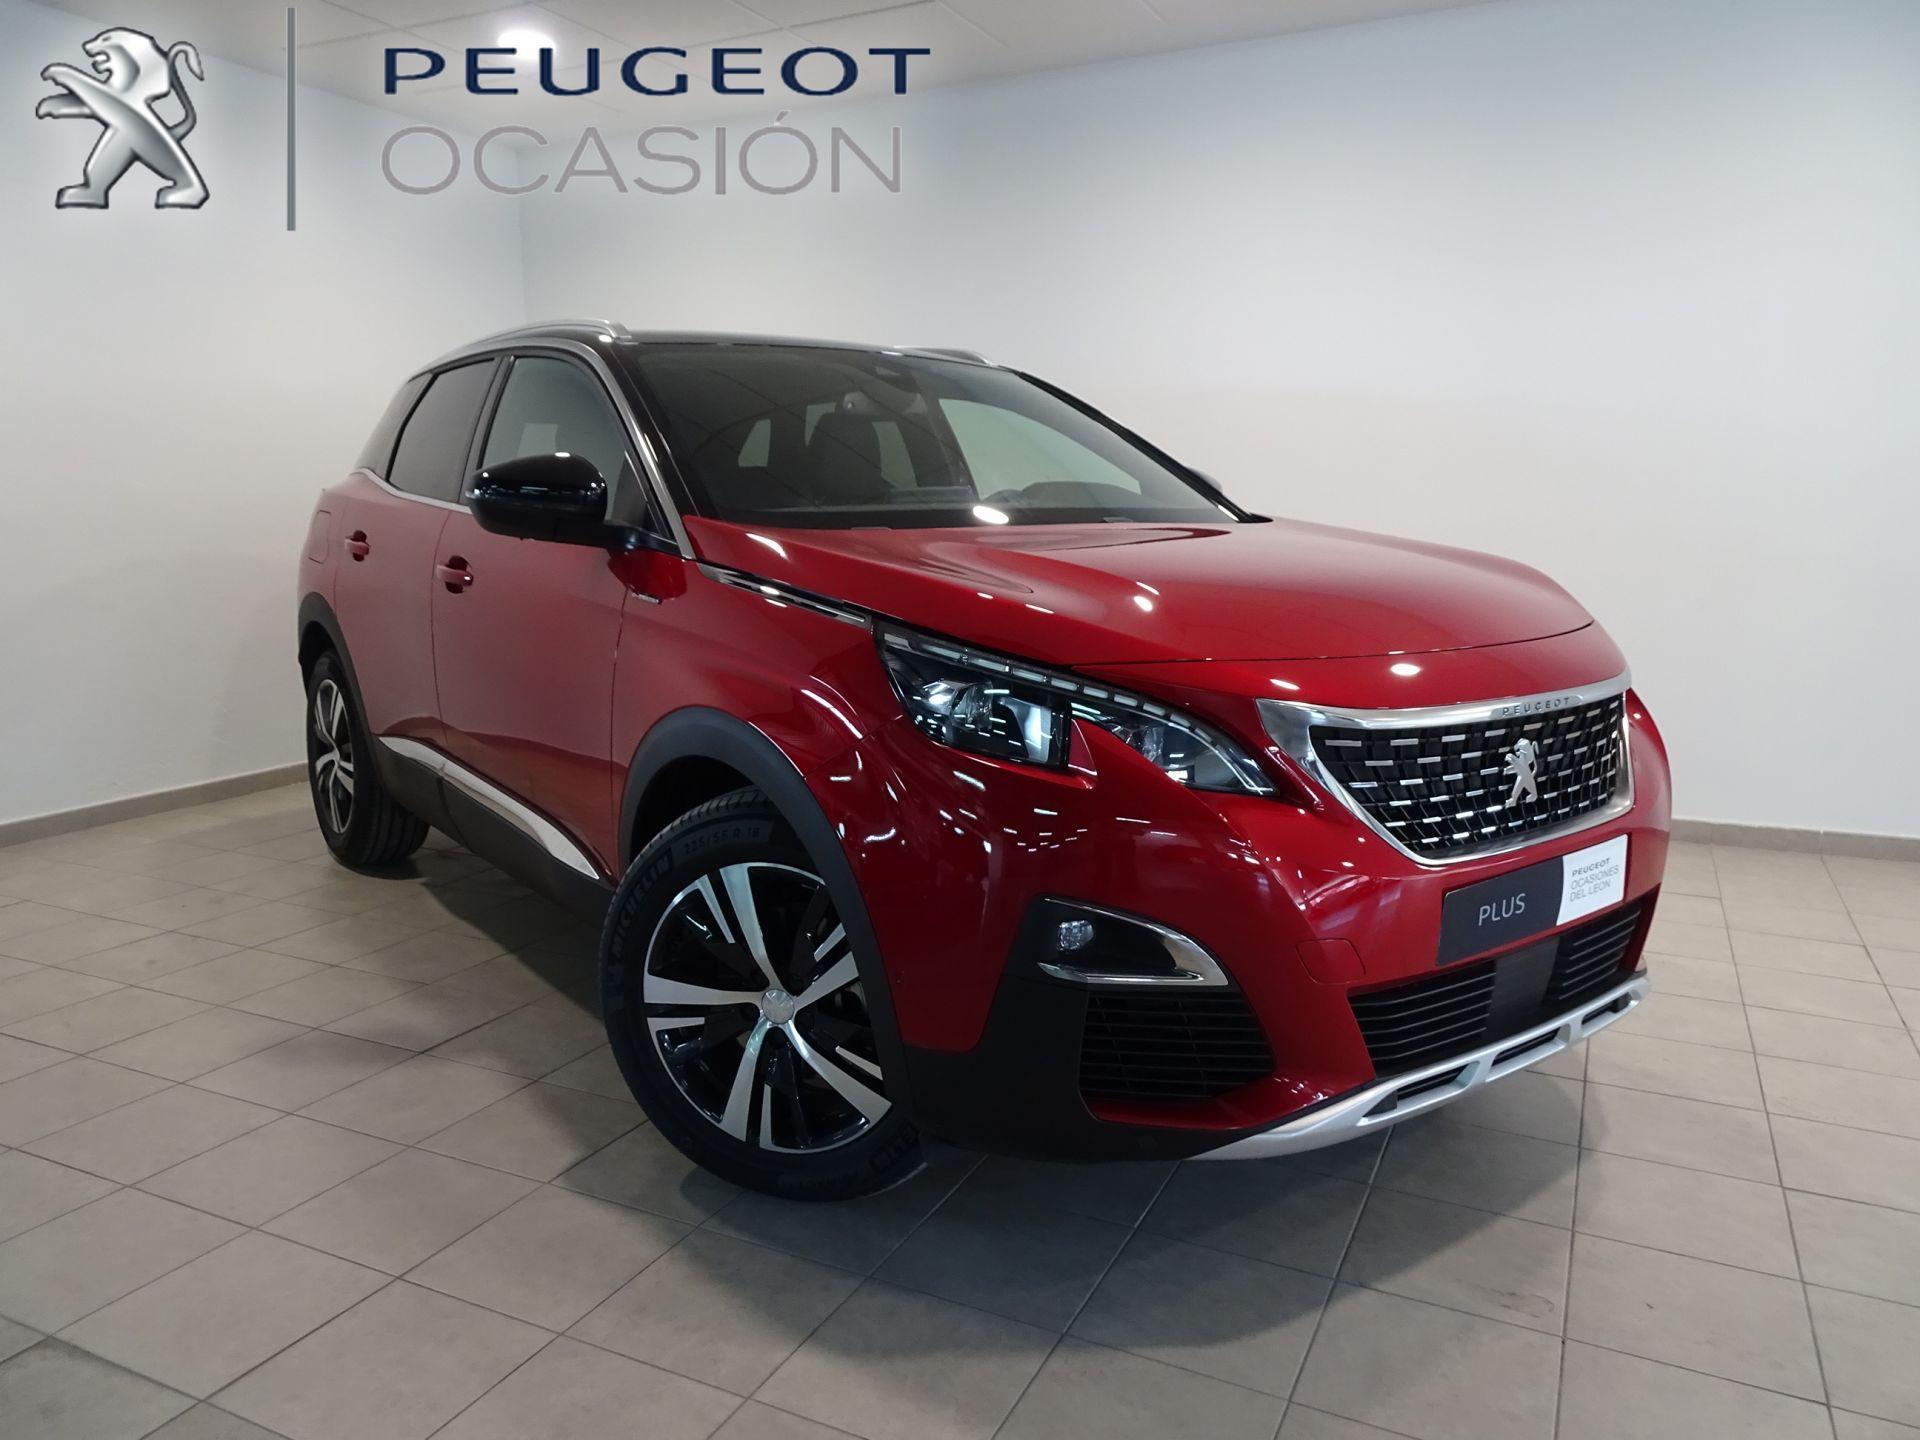 Peugeot 3008 1.2 PureTech 96KW (130CV) S&S GT Line segunda mano Cádiz